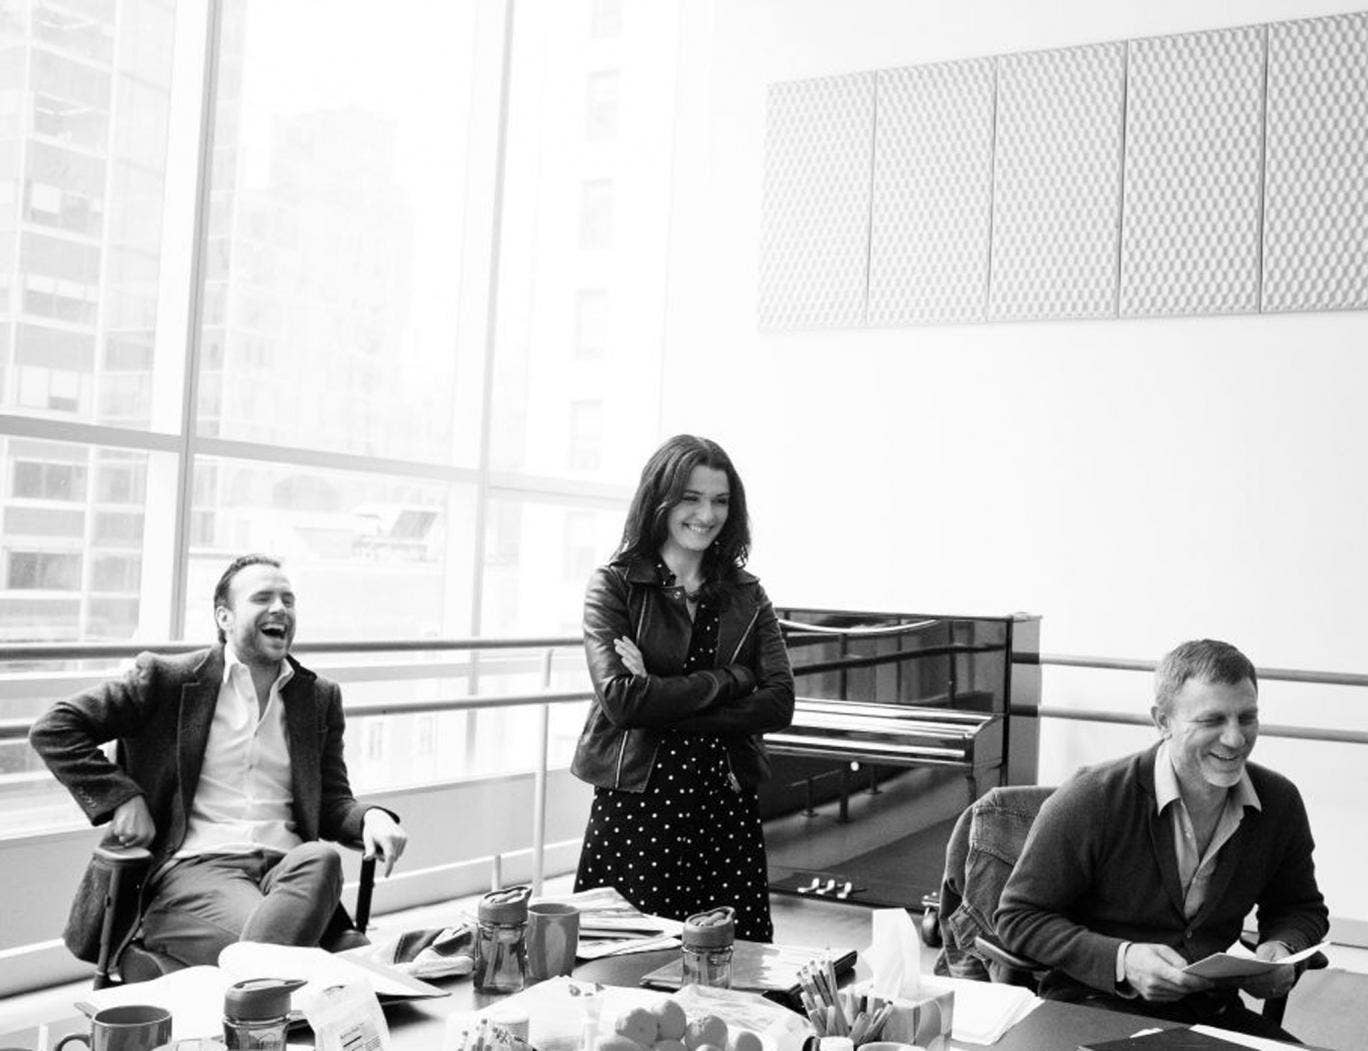 Rafe Spall (left), Rachel Weisz (centre) and Daniel Craig in rehearsals for Betrayal